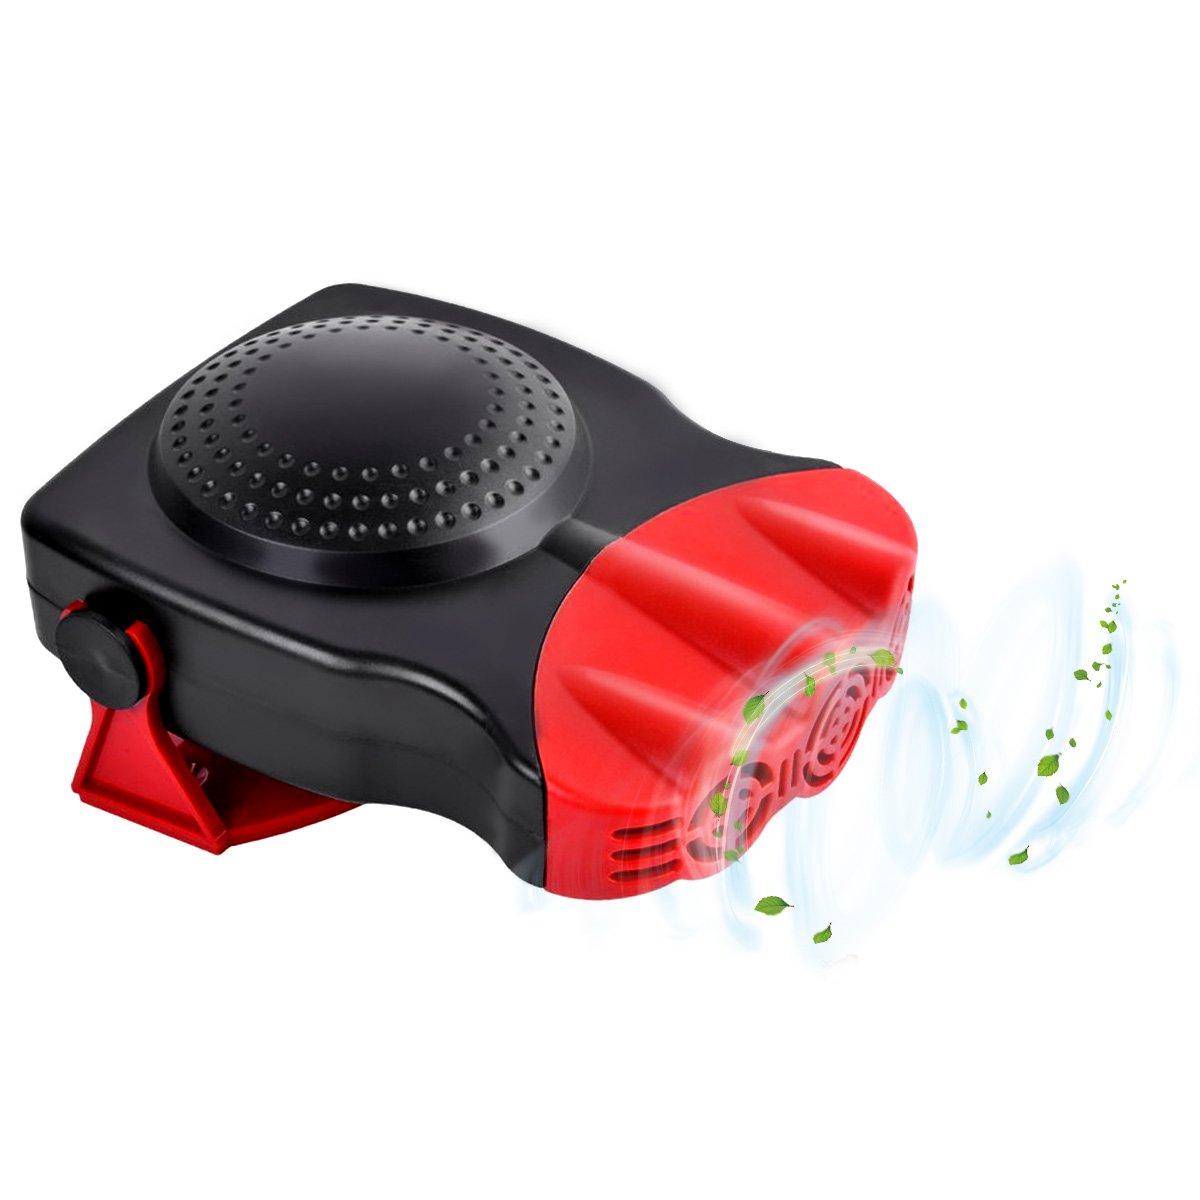 2 In 1 Electric Car Ceramic Heating Cooling Dryer Warmer Fan Demister Defroster Ebay Motors Exterior